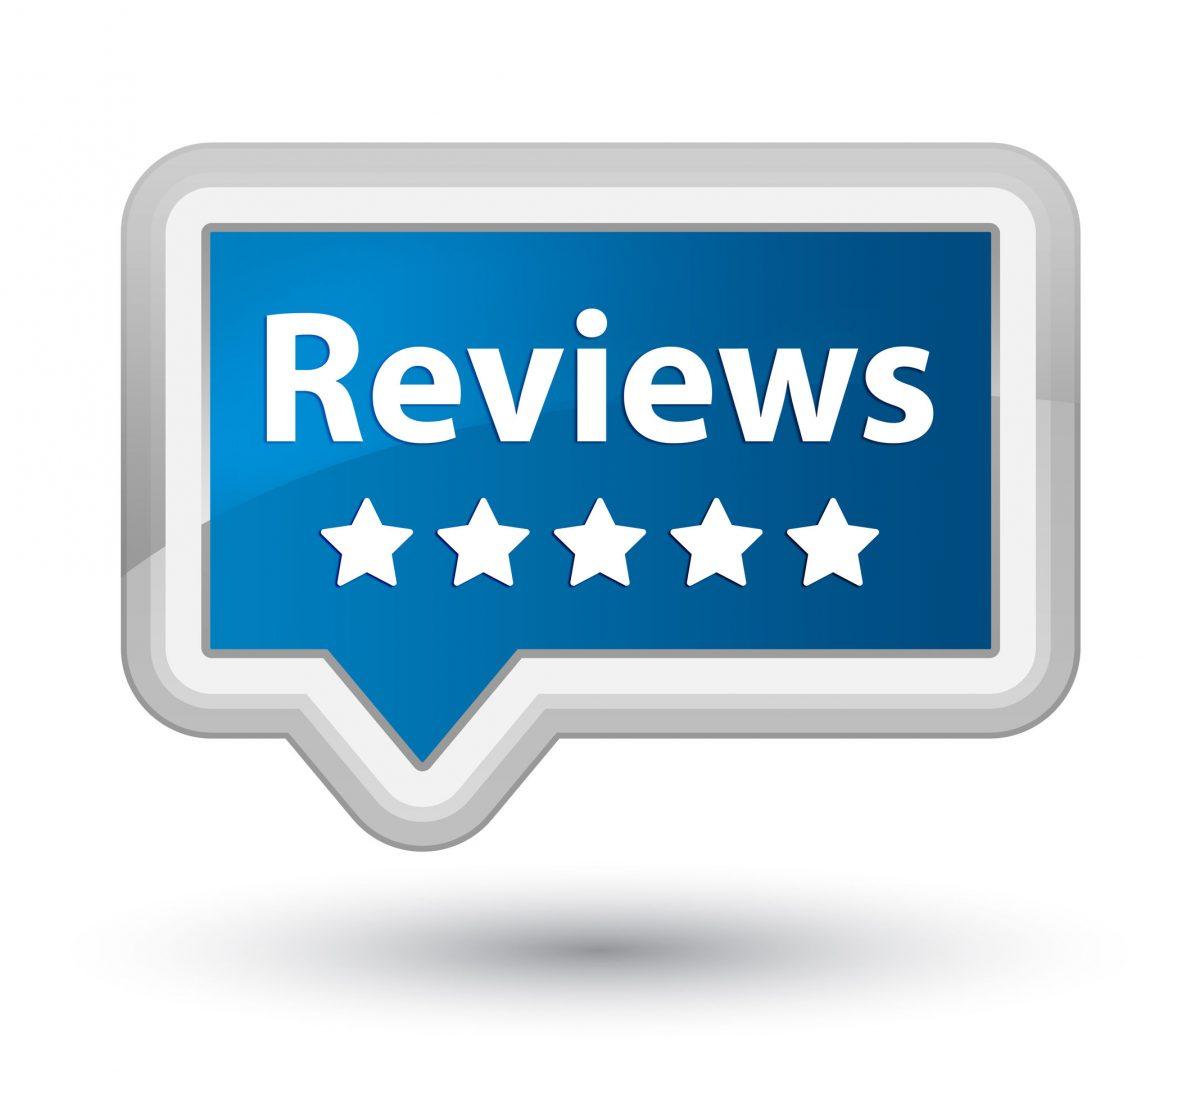 25300299 - reviews